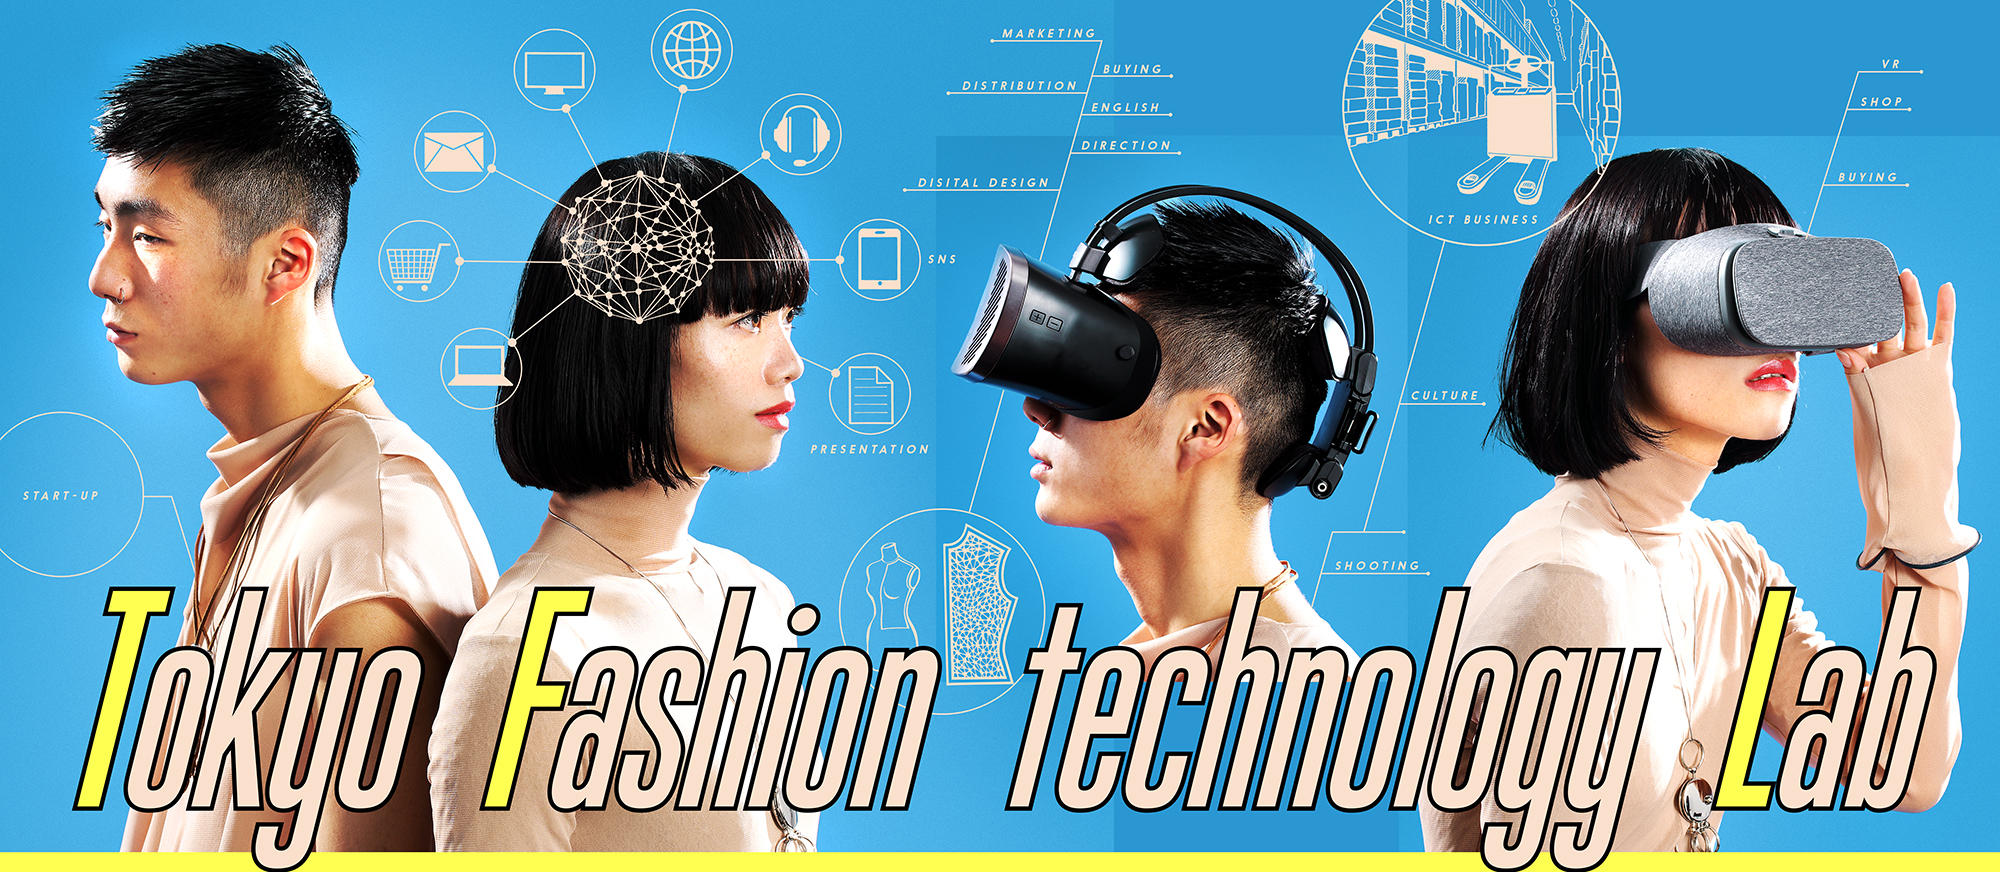 Tokyo Fashion thechnology Lab ビジュアル